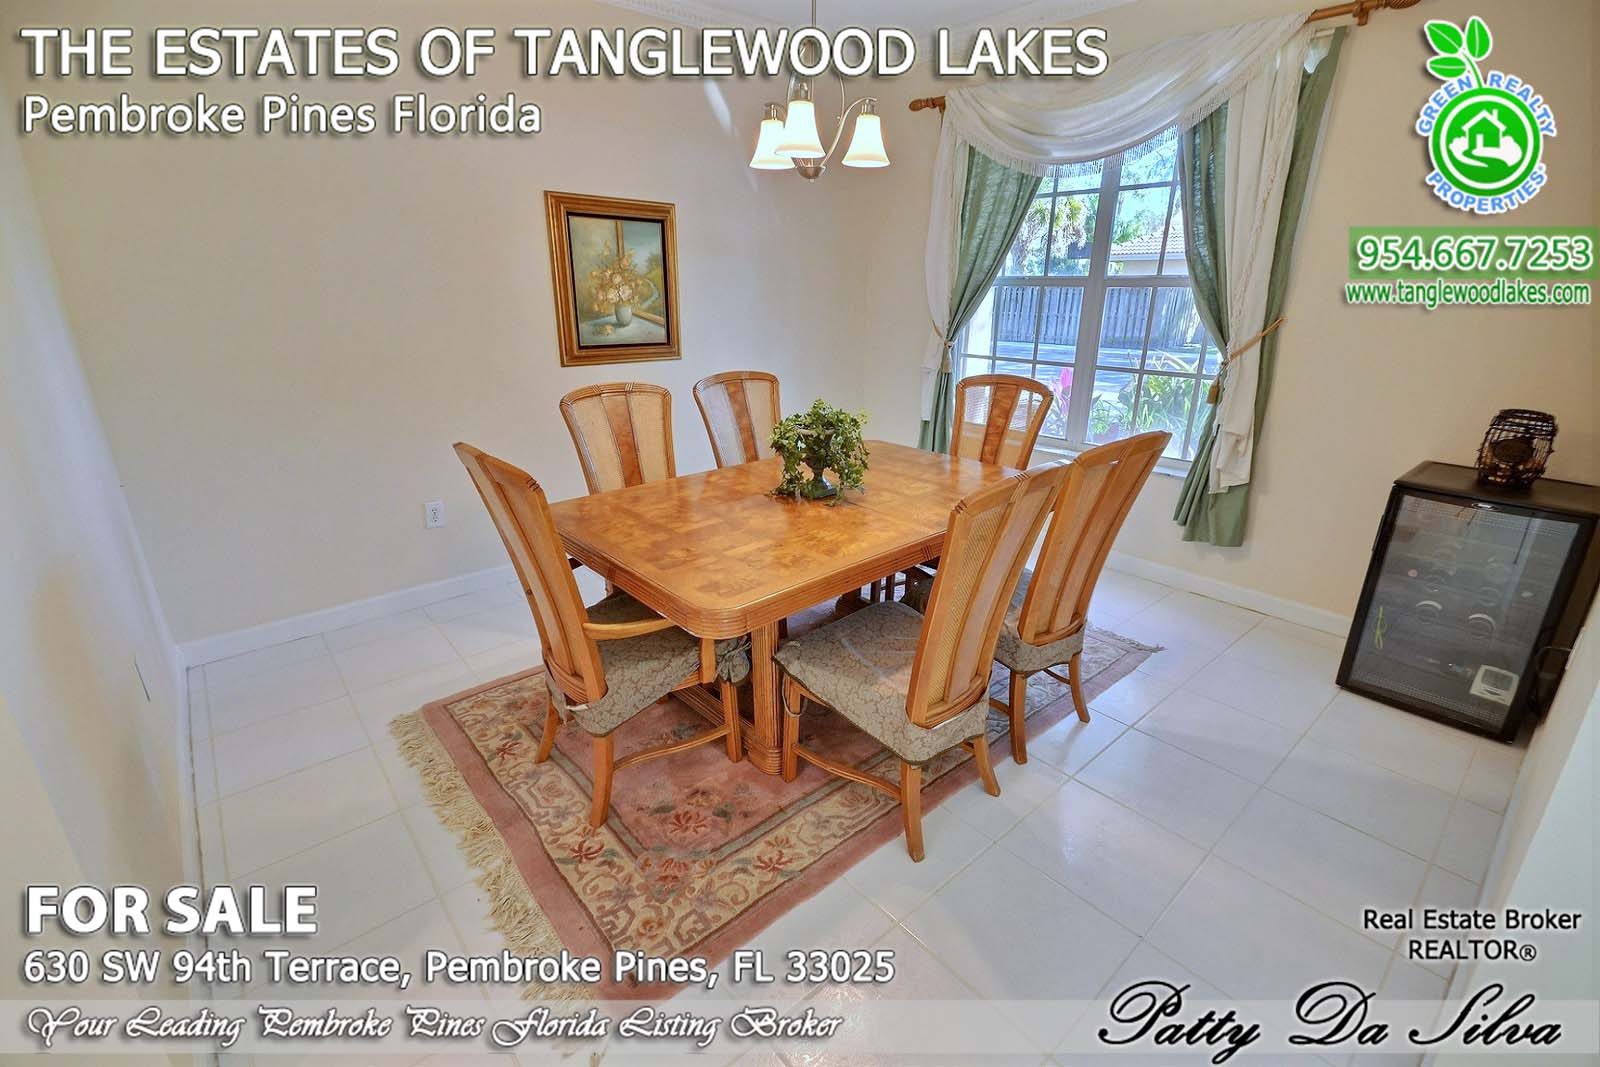 The Estates of Tanglewood Lakes